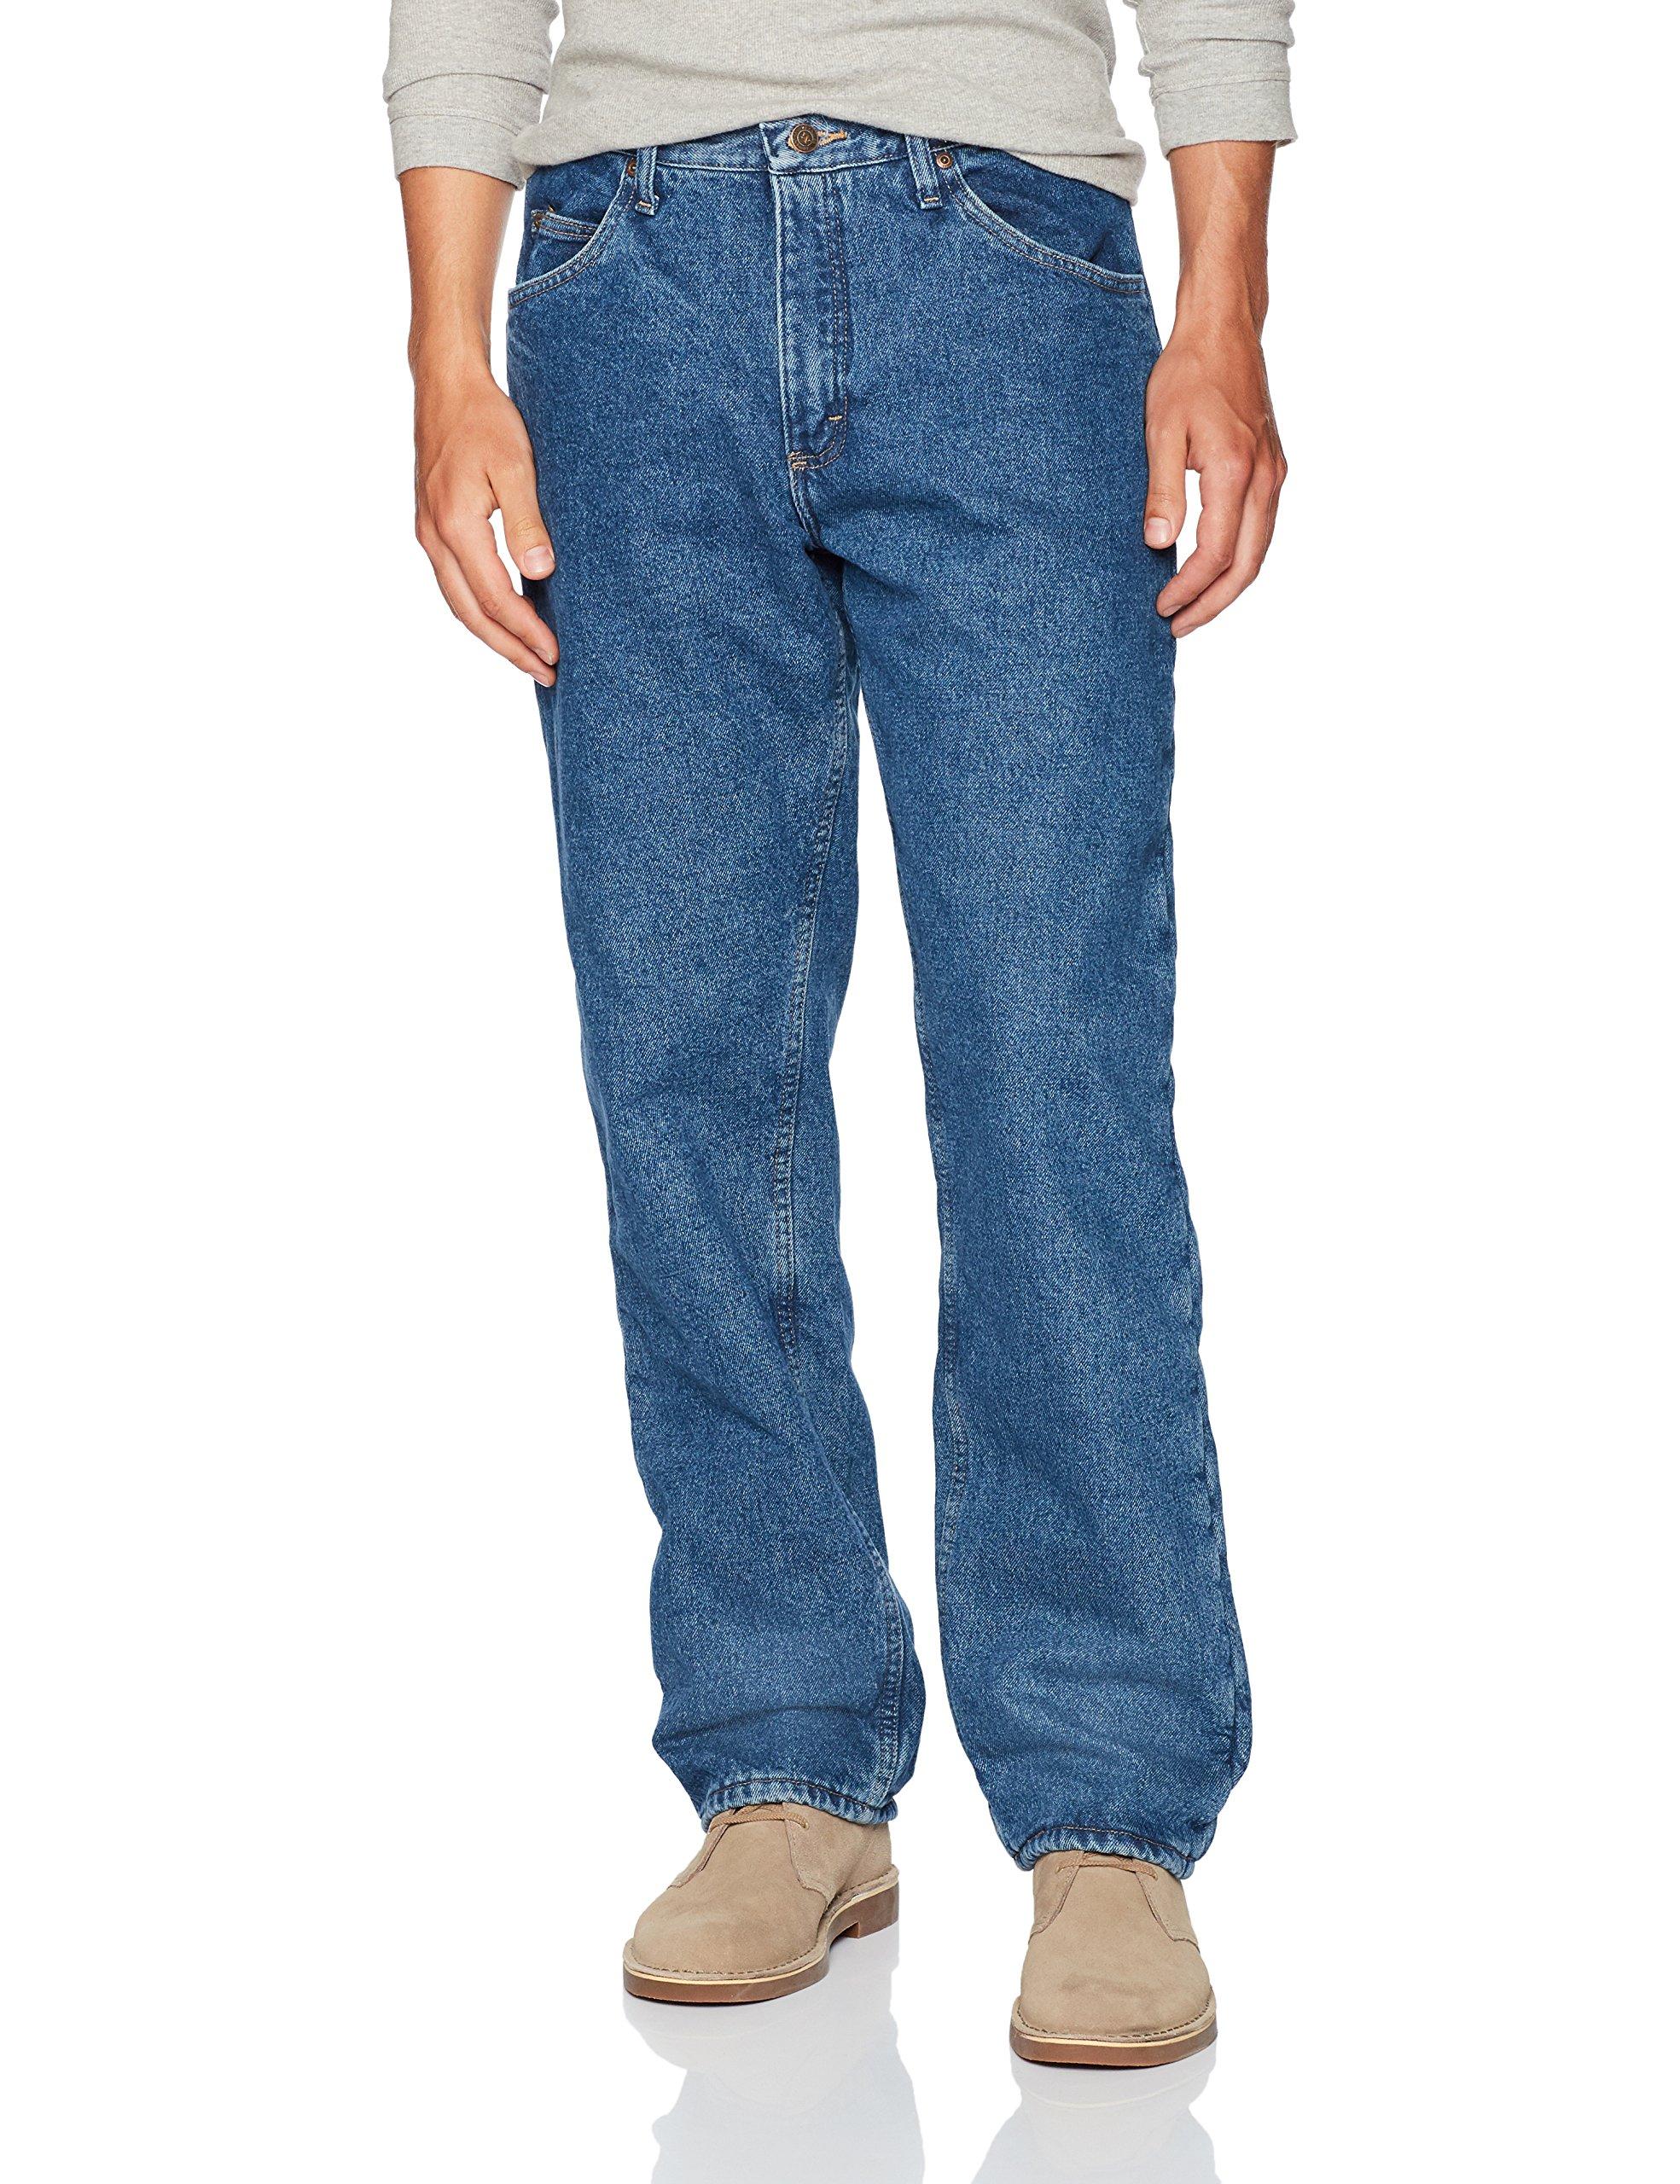 Wrangler Men's Authentics Fleece Lined 5 Pocket Pant, Stonewash, 34X32 by Wrangler